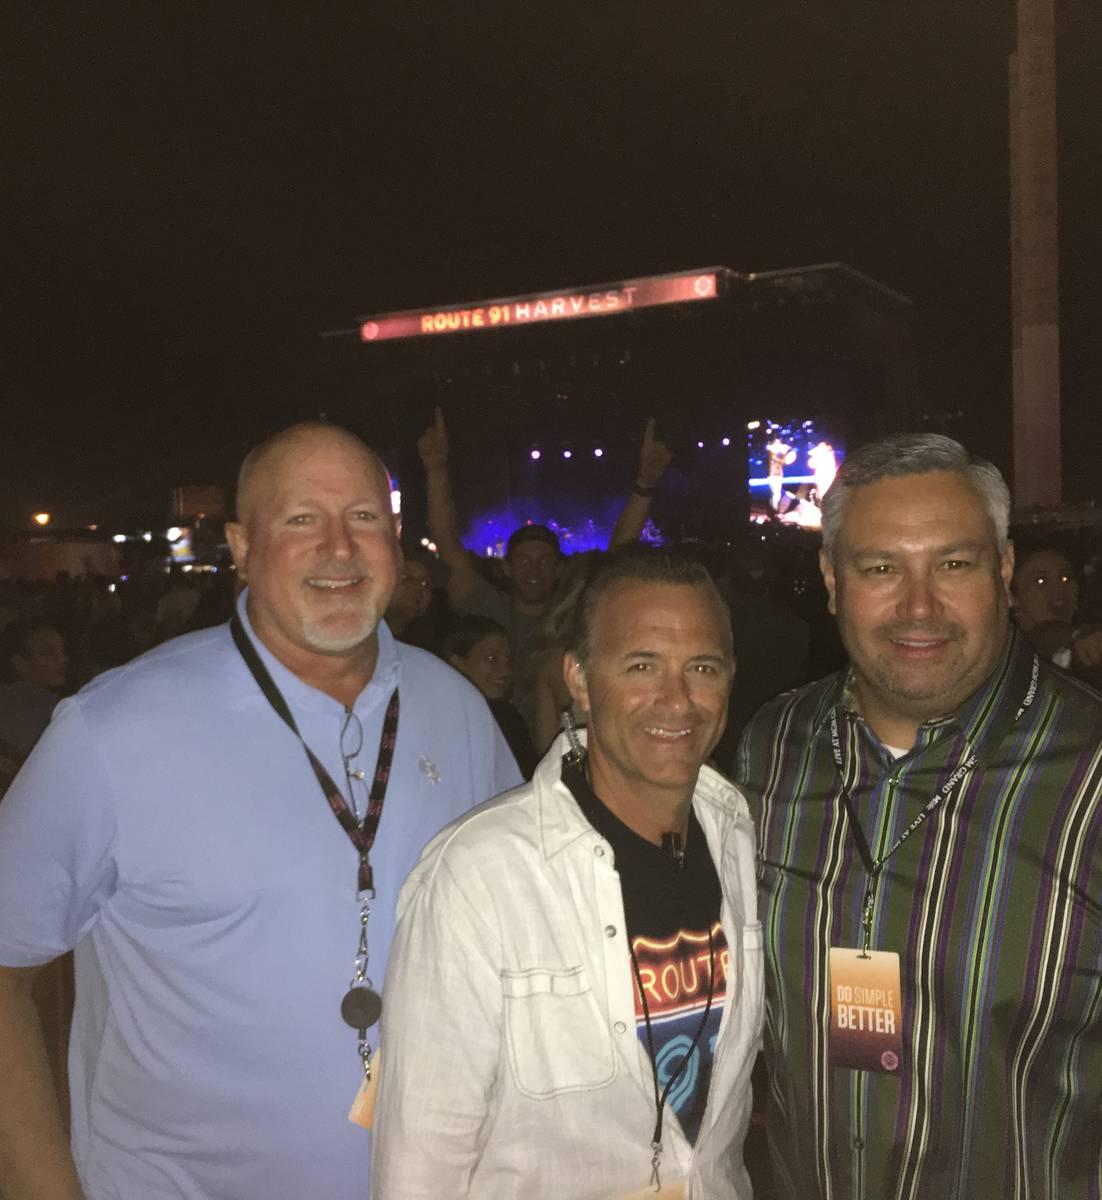 MGM Resorts International entertainment execs Mark Prows, Daren Libonati and Chris Baldizan are ...